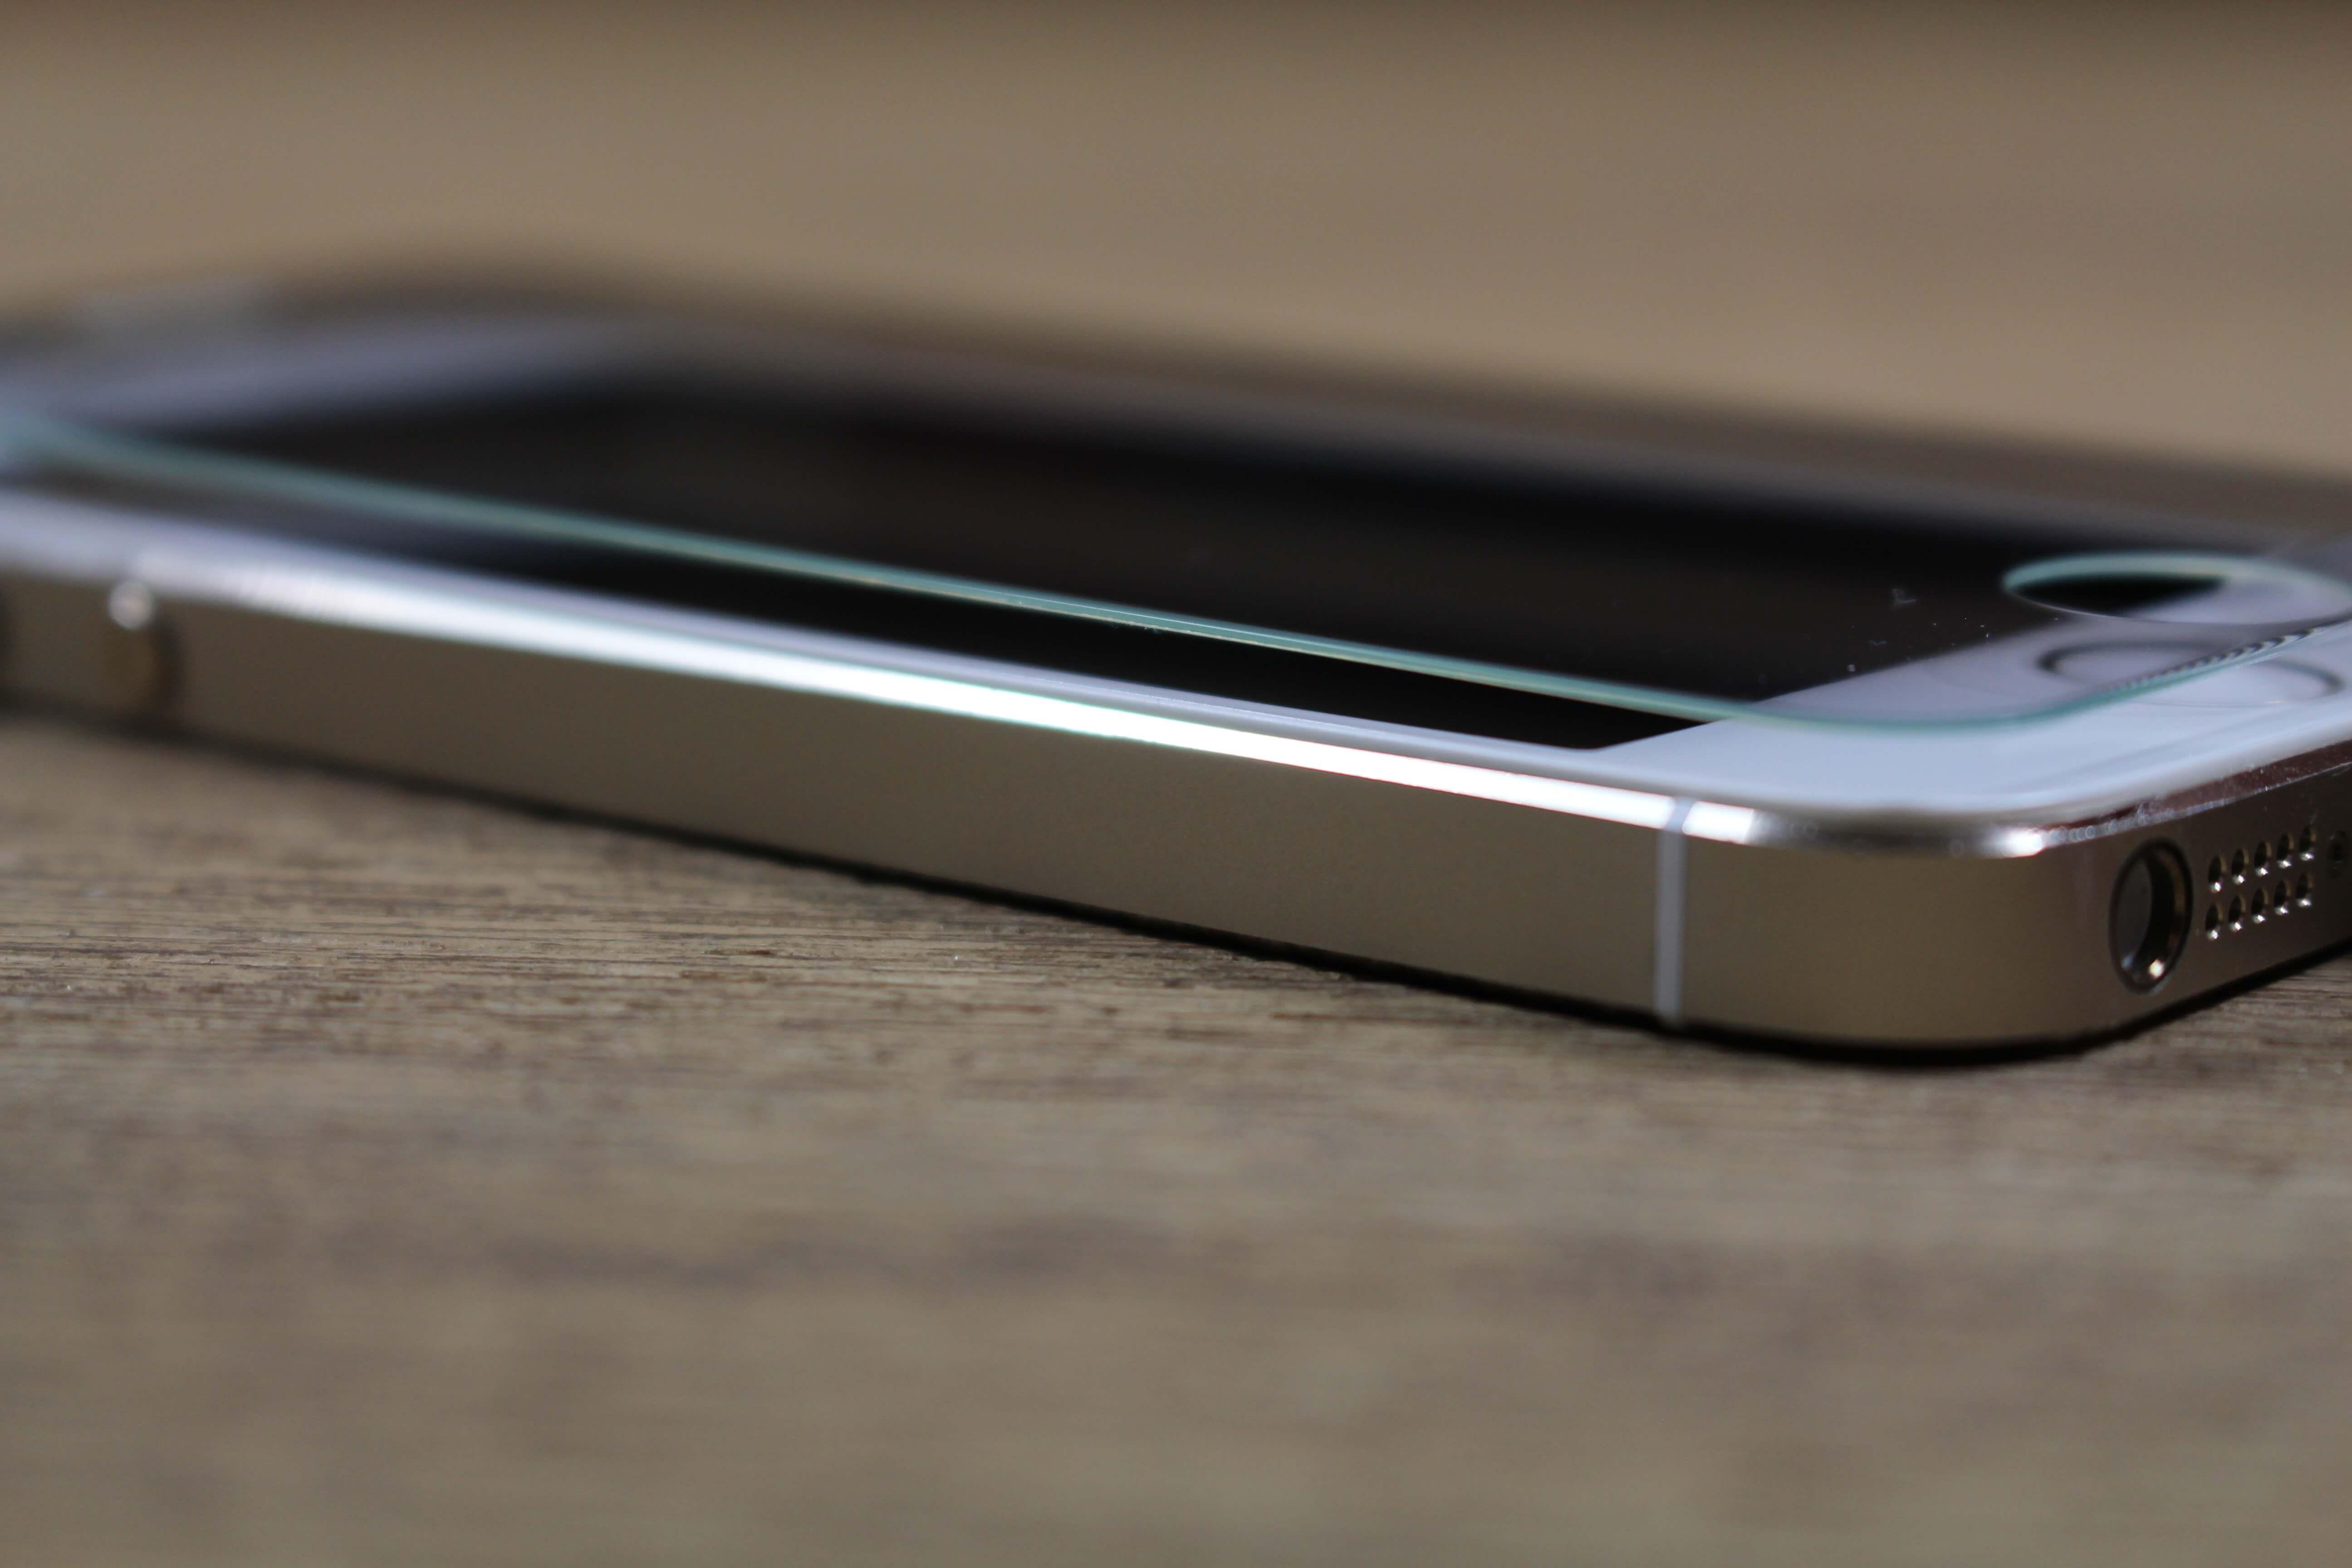 Displayschutz iPhone 5s Seite